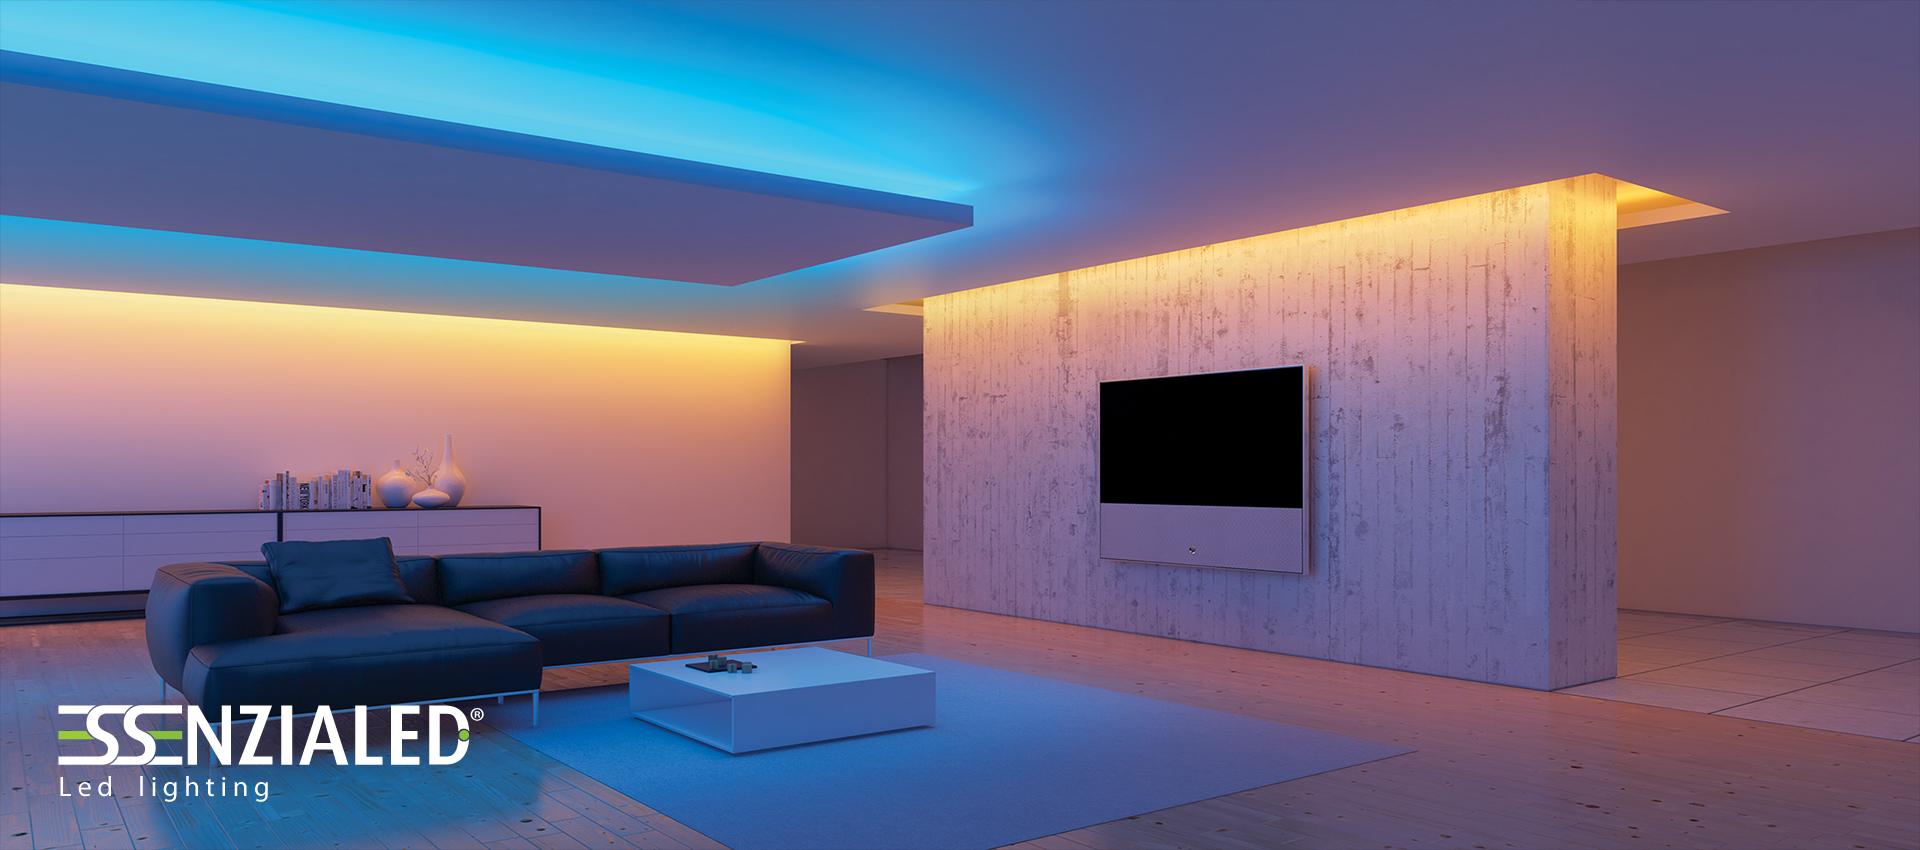 Illuminazione led per abitazioni su misura made in for Luce a led per casa